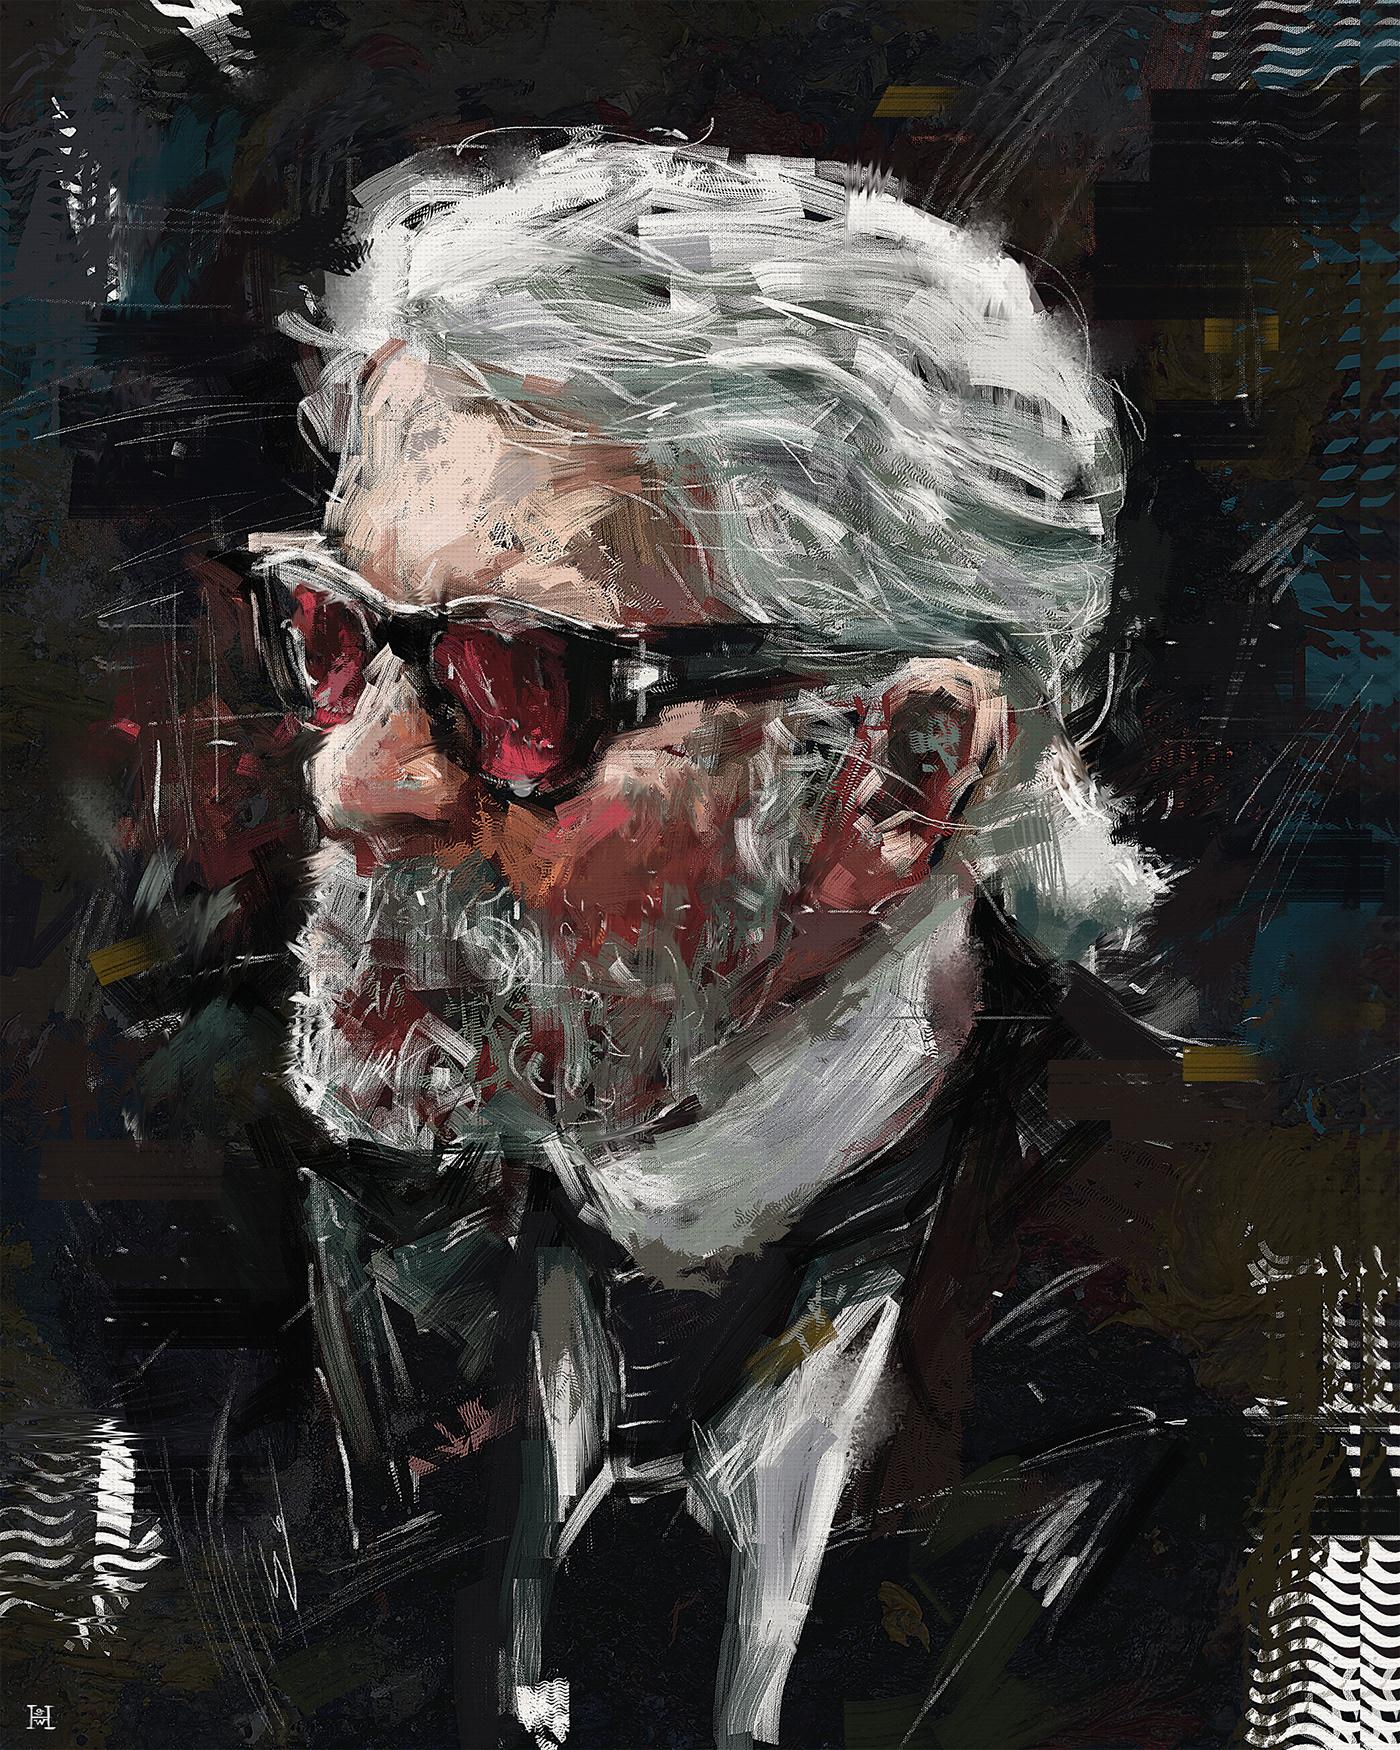 digitalpainting fashionillustration gentlemen impressionism mensfashion painting   rough Sartorial seungwonhong Style